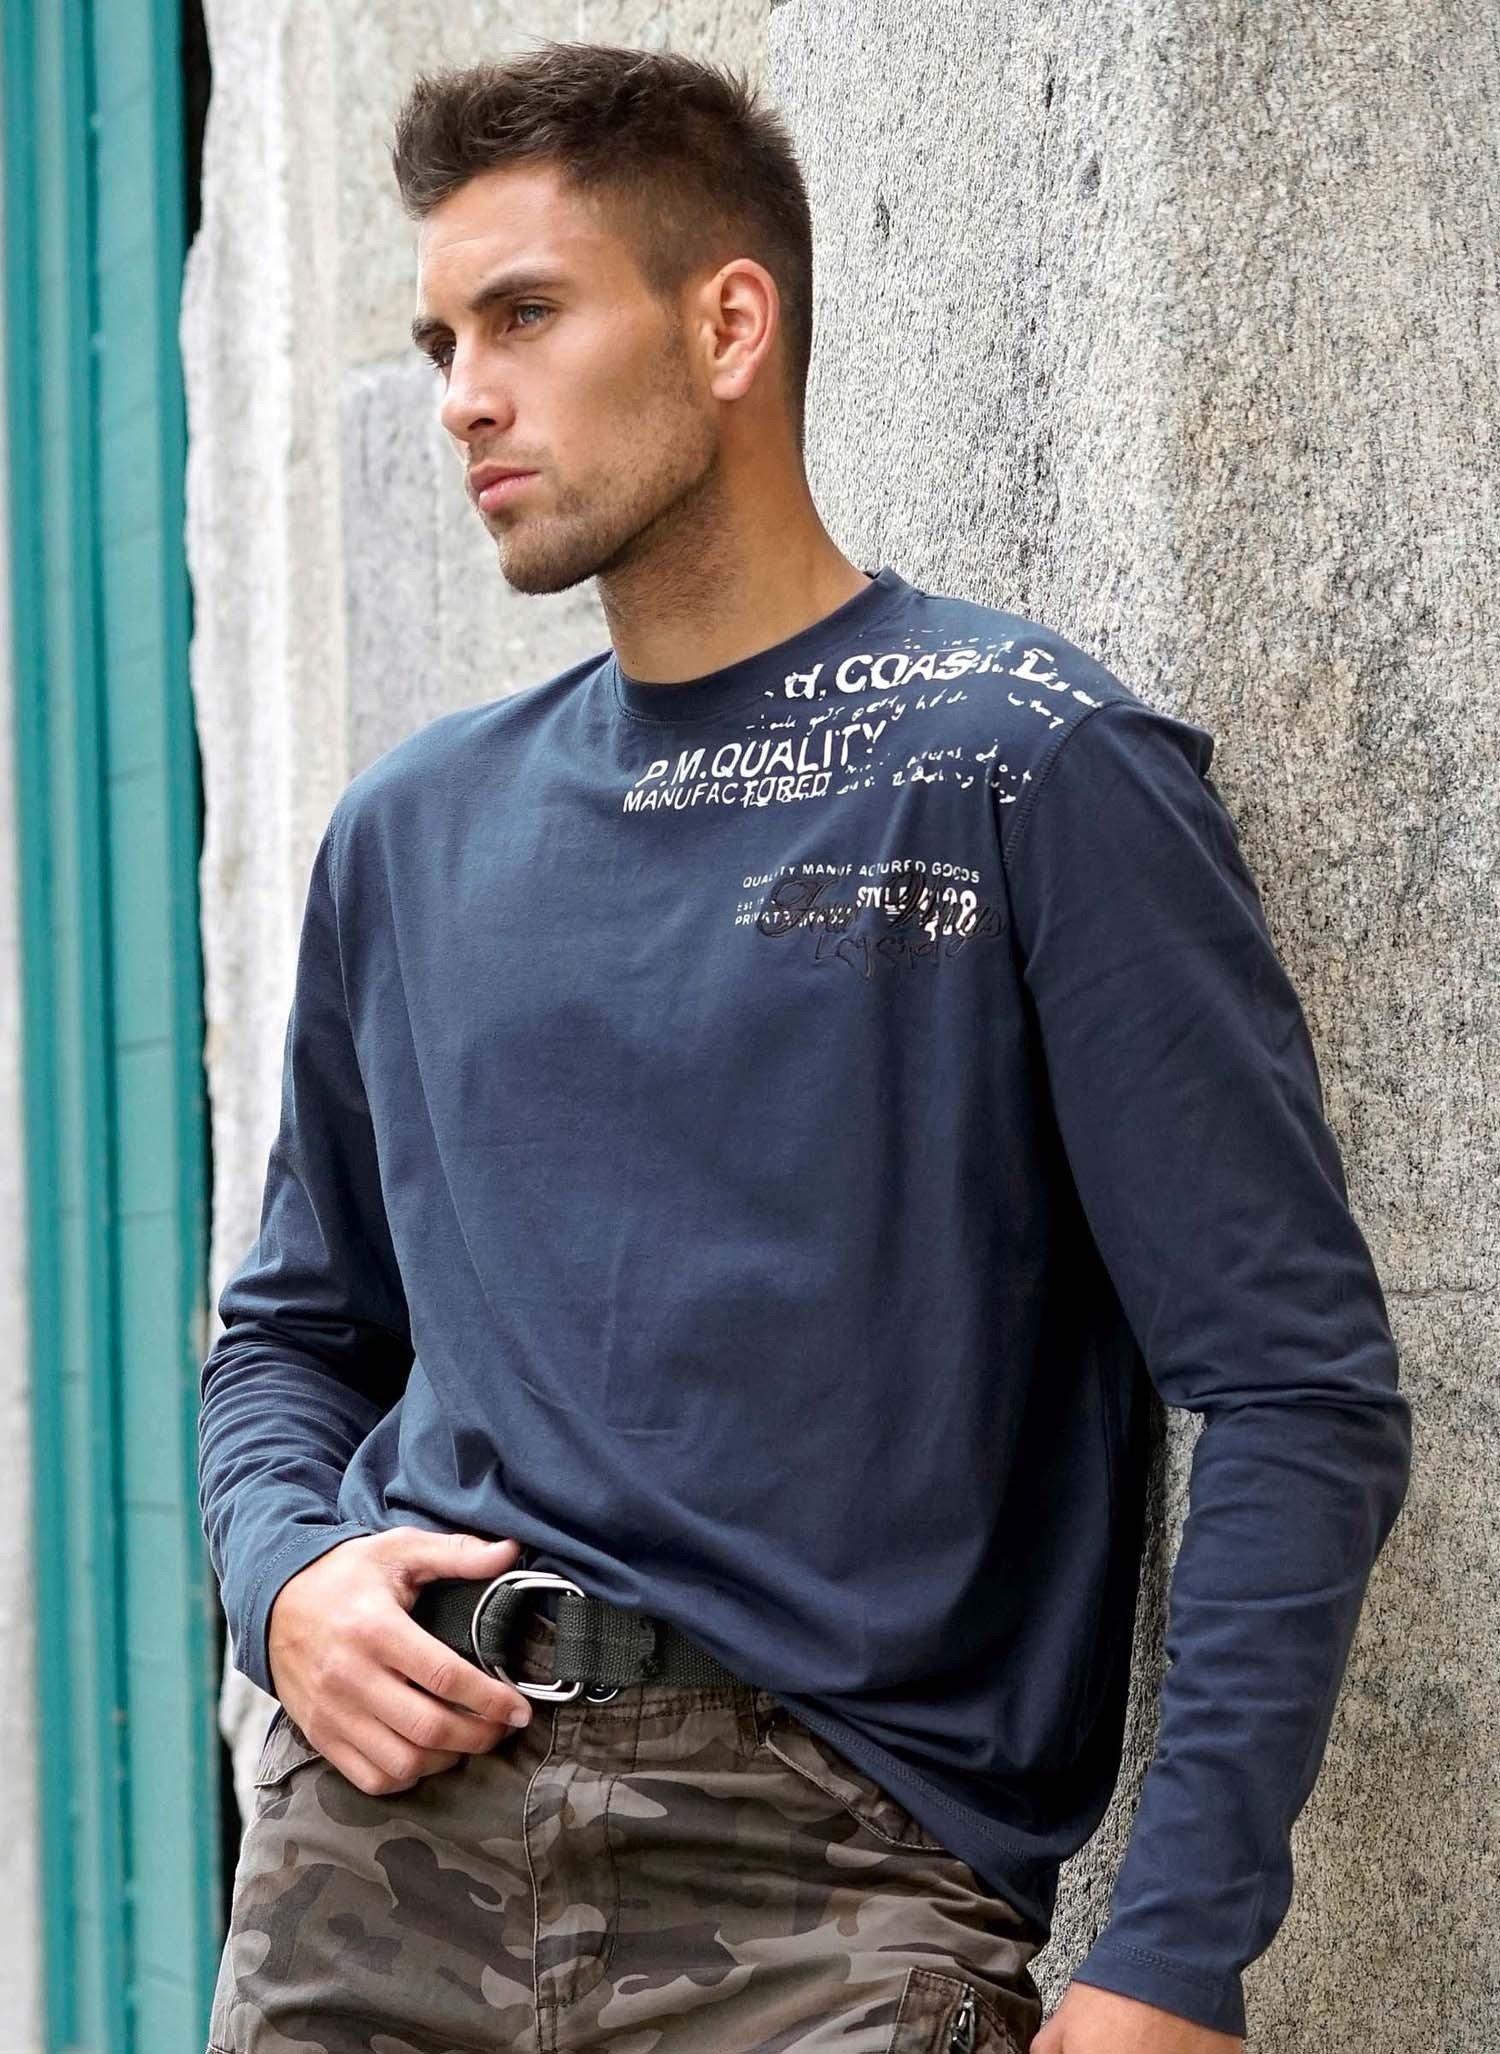 H-LA-Shirt,Rücken-Pr.indigobl. L - 1 - Ronja.ch